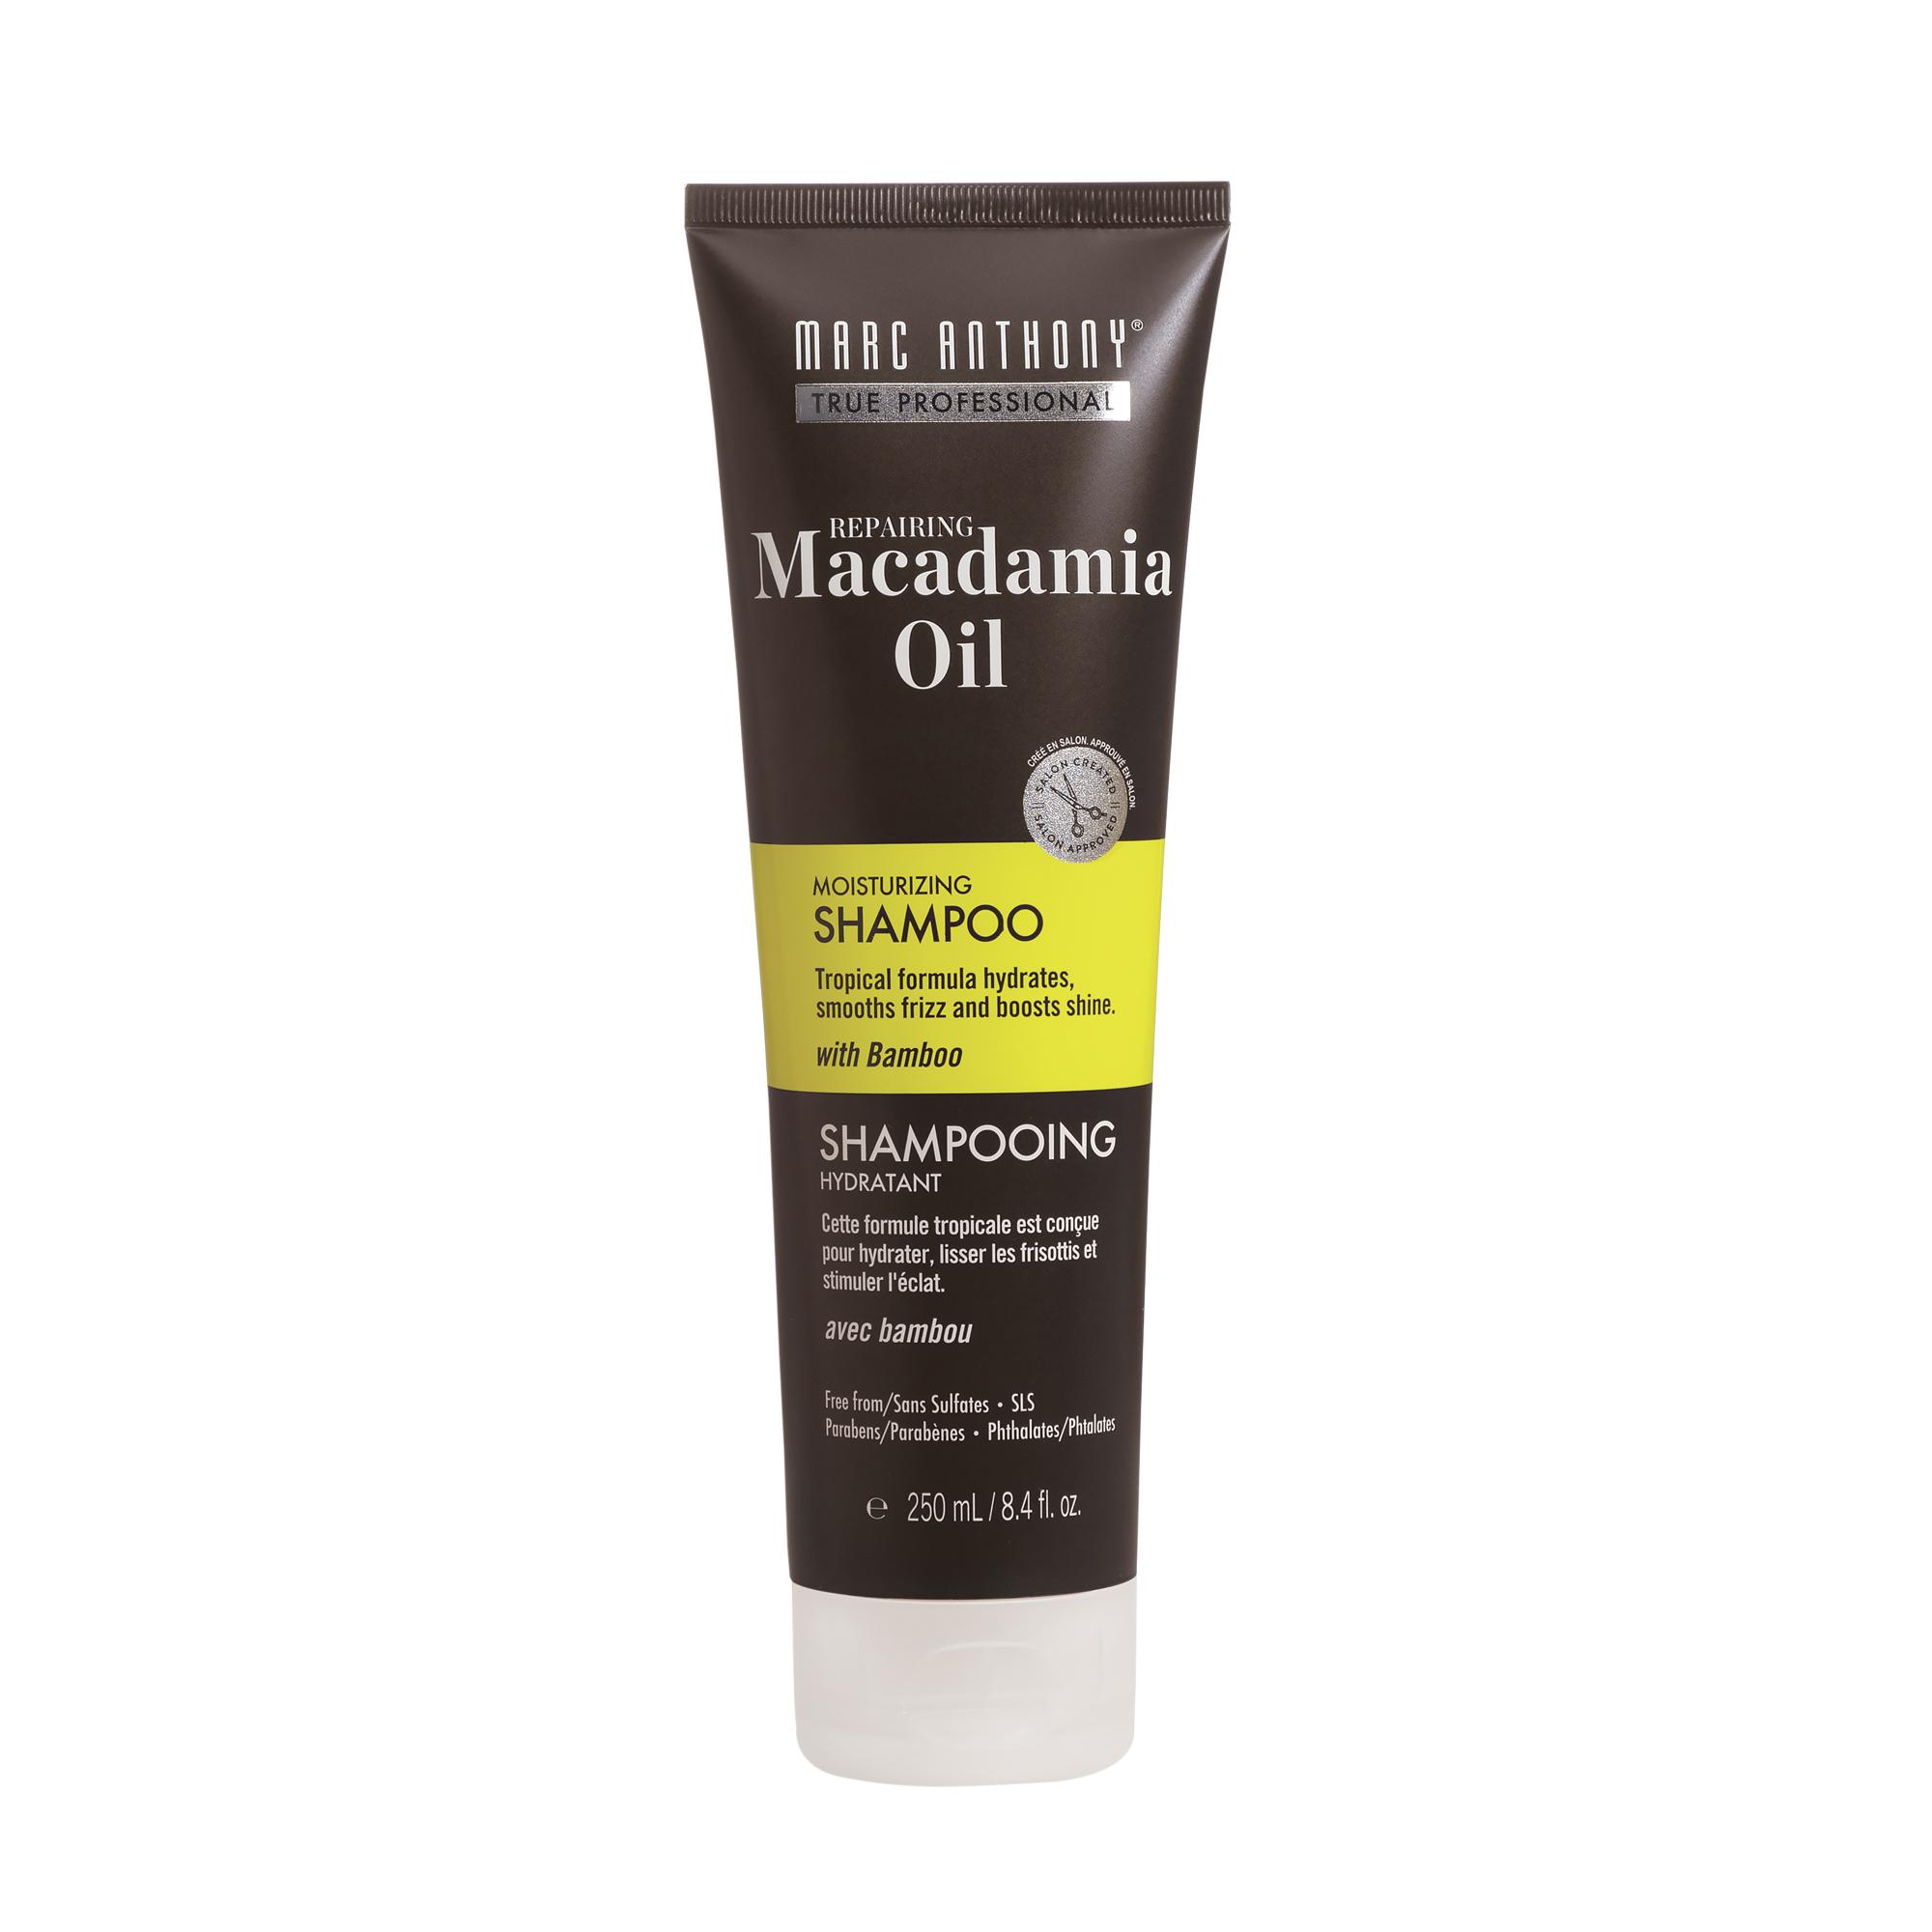 Repairing Macadamia Oil Shampoo